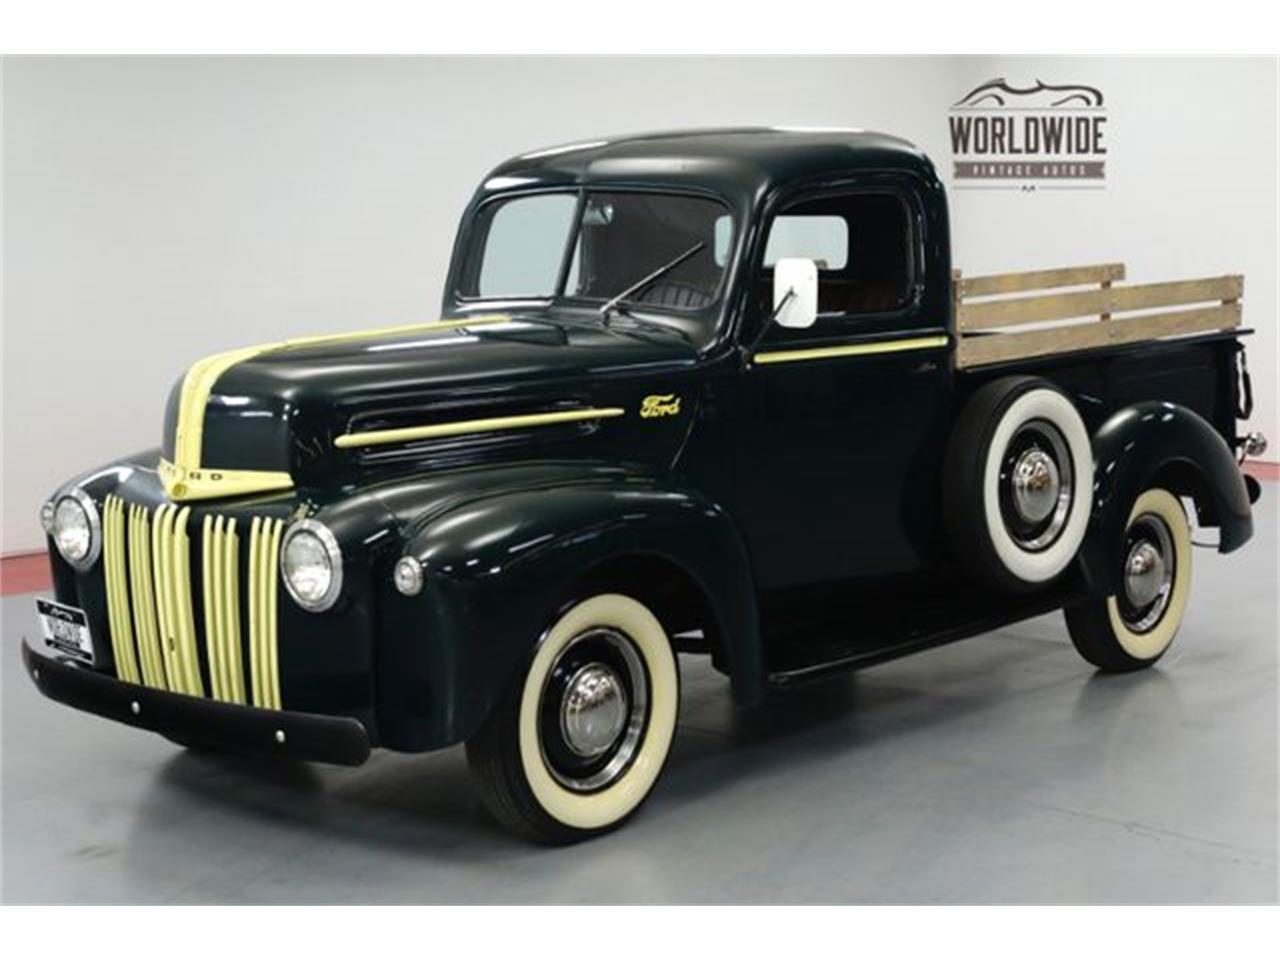 13460088 1946 ford f100 std 1946 ford f100 for sale classiccars com cc 1142539